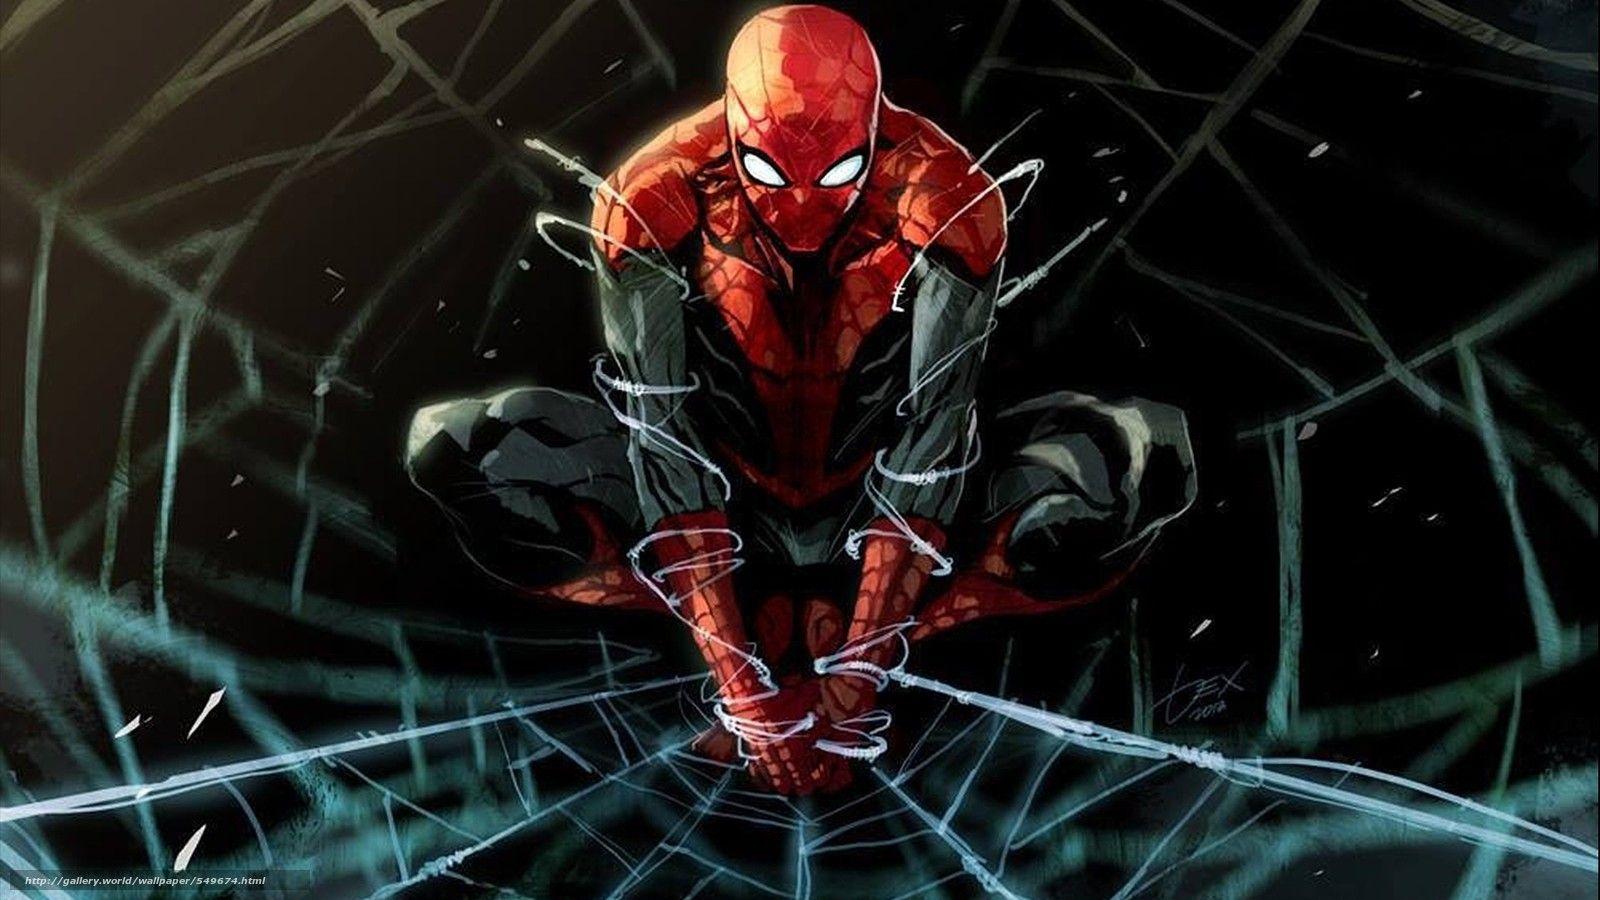 Tlcharger fond d 39 ecran spider man bande dessin e dessin - Dessin anime spider man ...